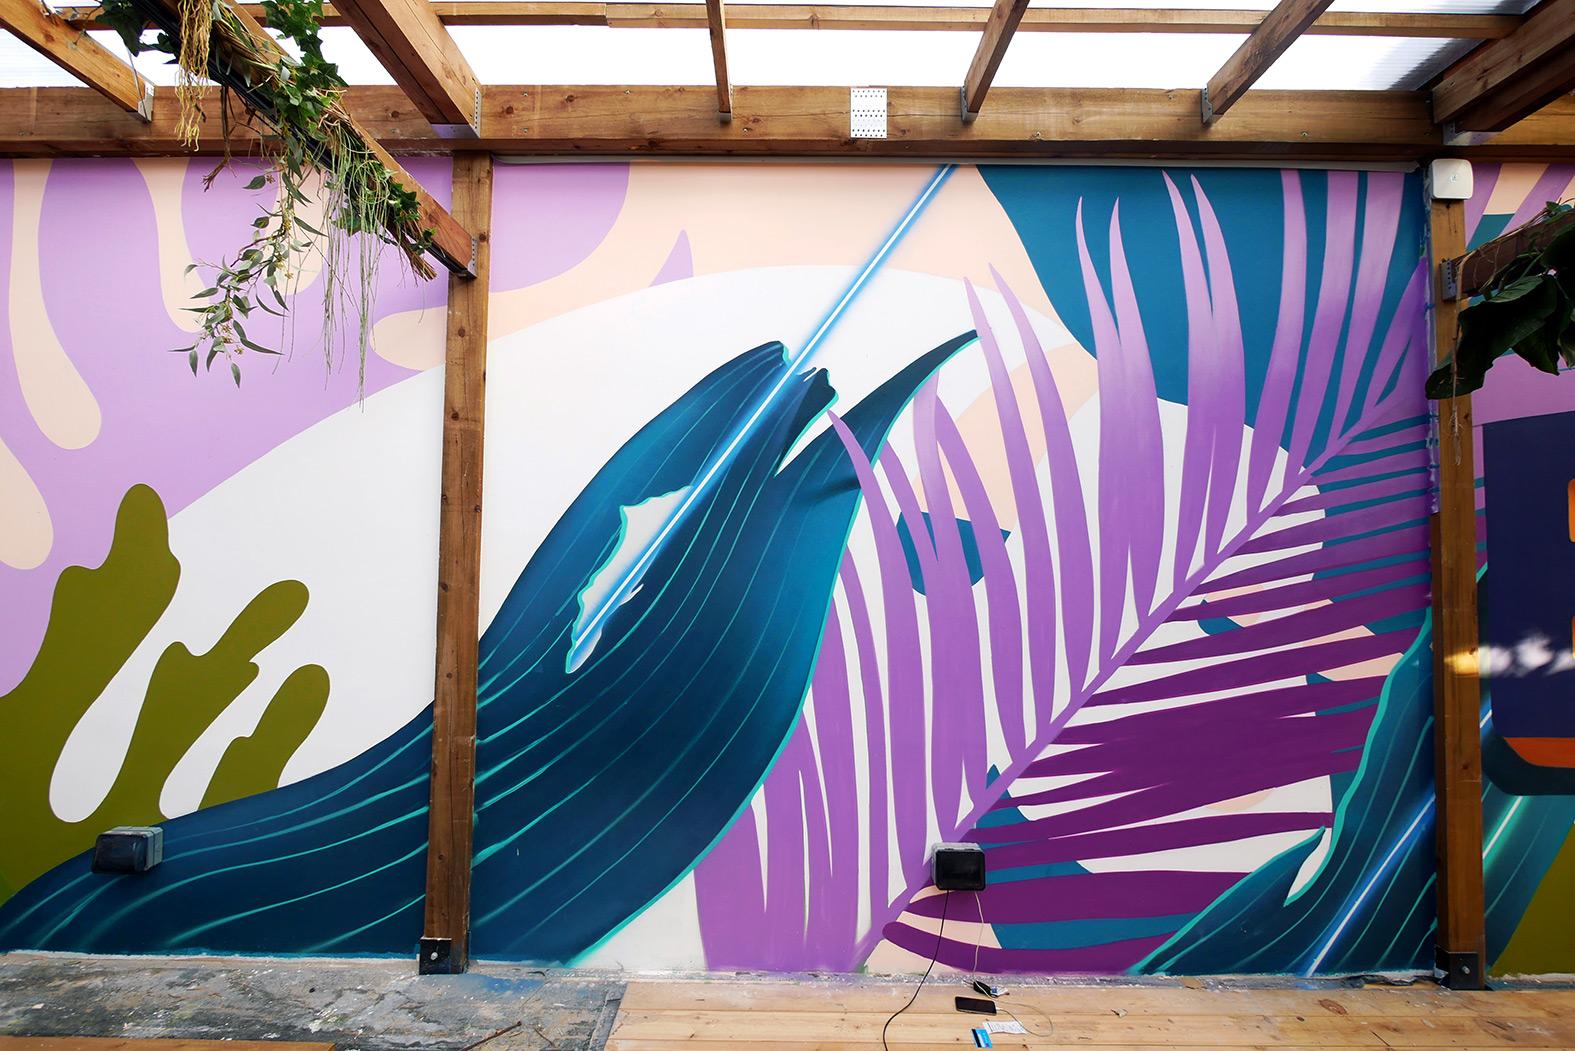 Nerone-lost-in-brixton-mural-painting-street-art-7